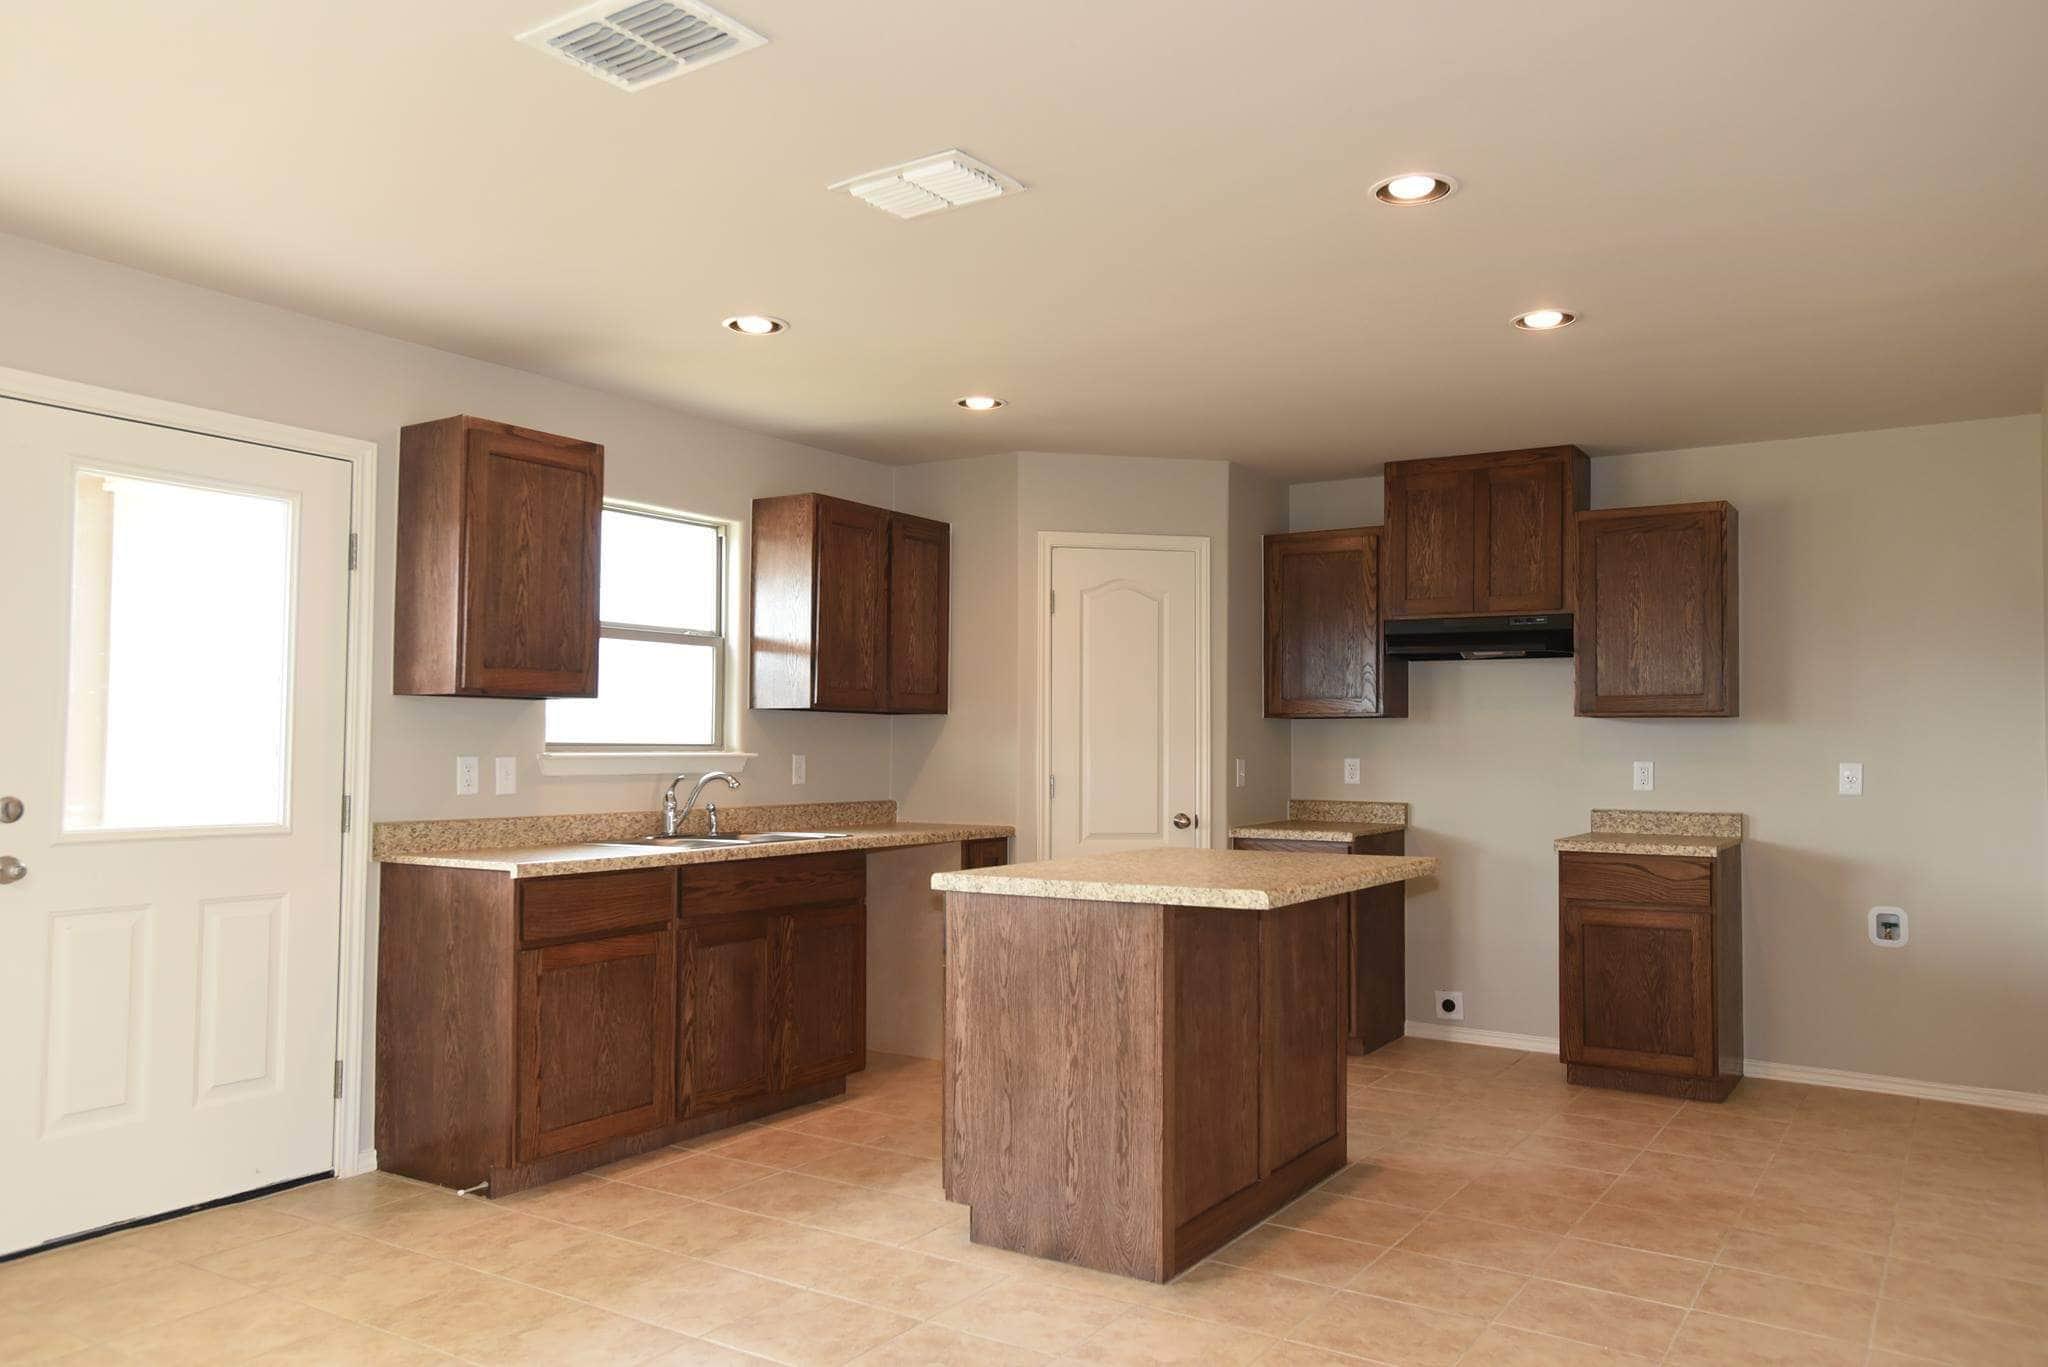 Kitchen featured in the Santa Elizabeth By WestWind Homes in Laredo, TX